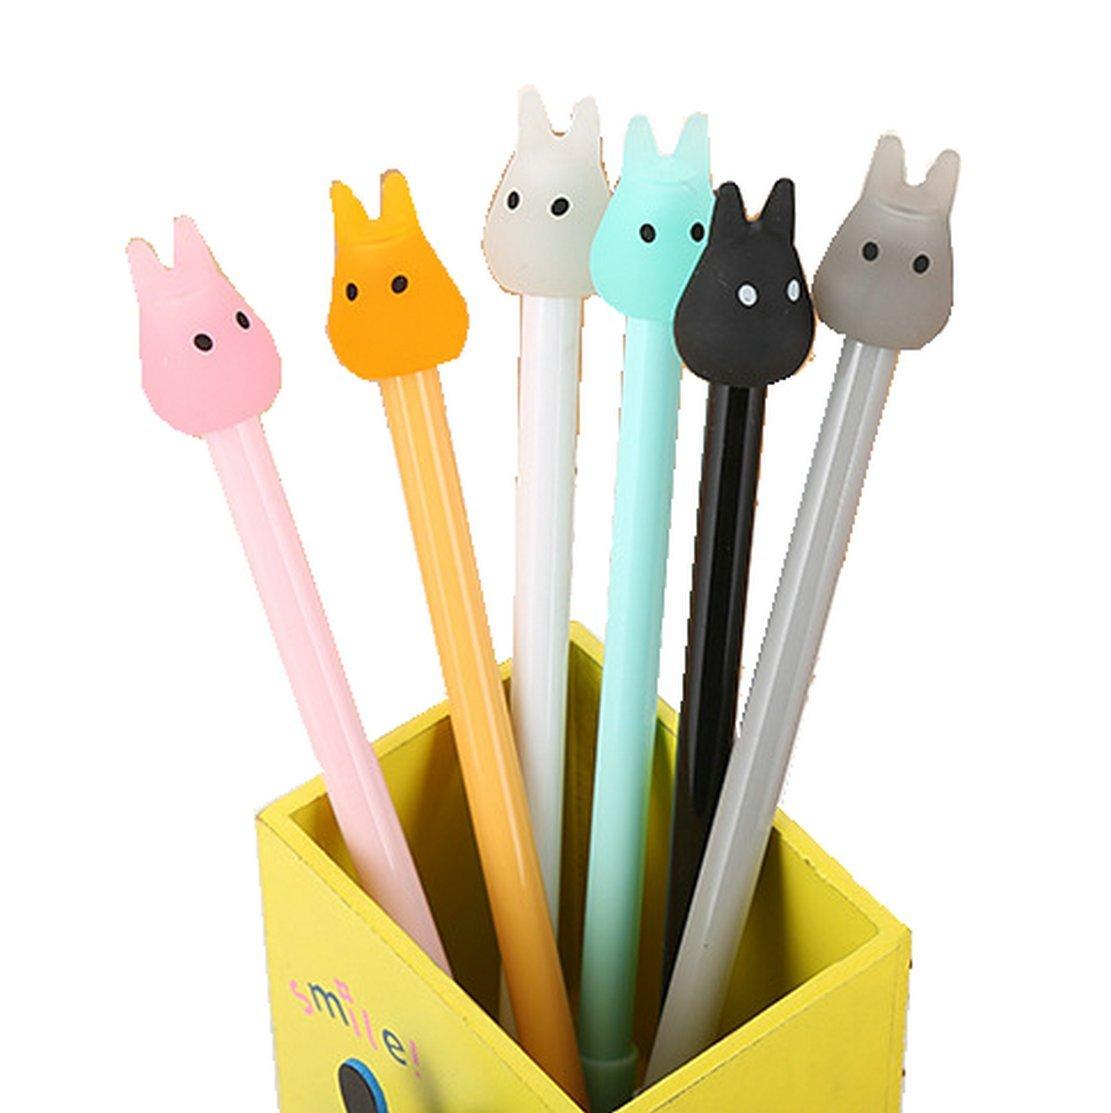 WIN-MARKET Fashion Cute Colorful Kawaii Lovely Cartoon Jelly color Totoro Gel Ball Pens Office School Supply Stationery(8PCS)